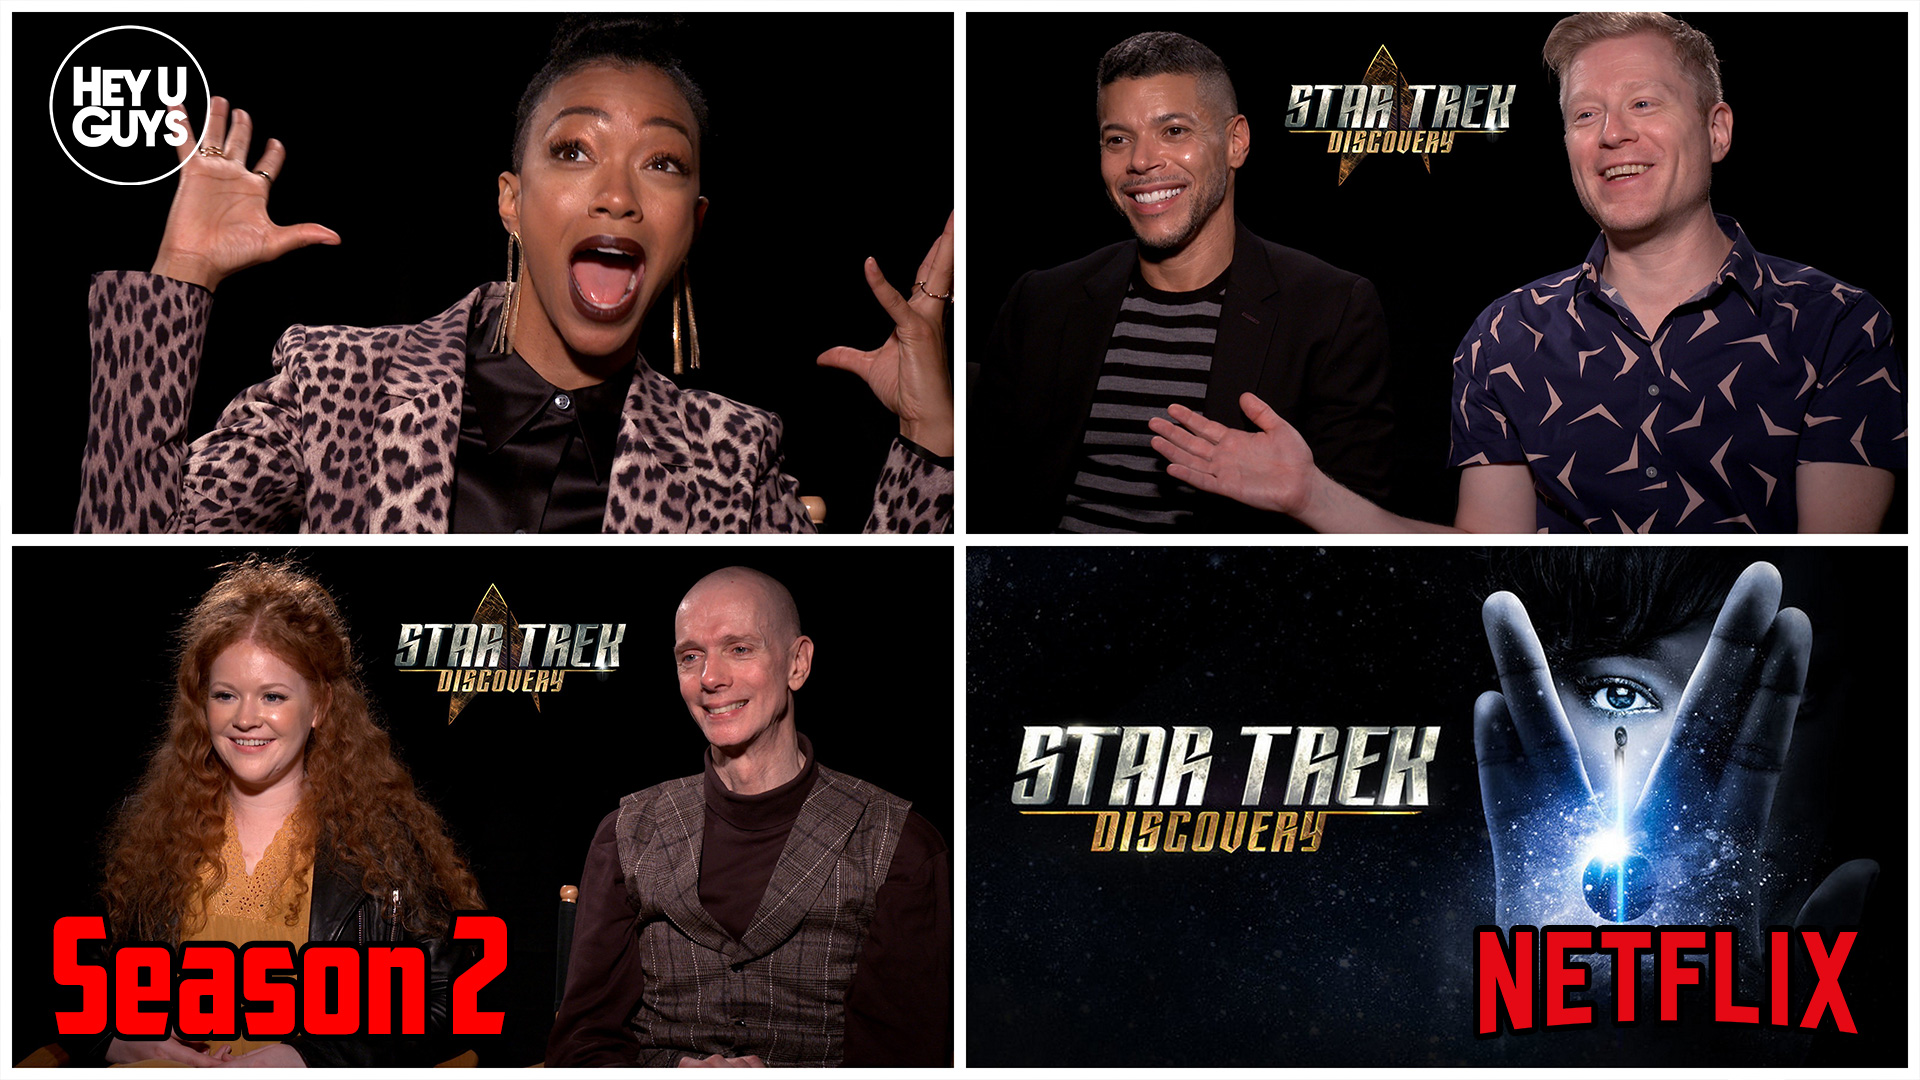 star-trek-discovery-season-2-interviews